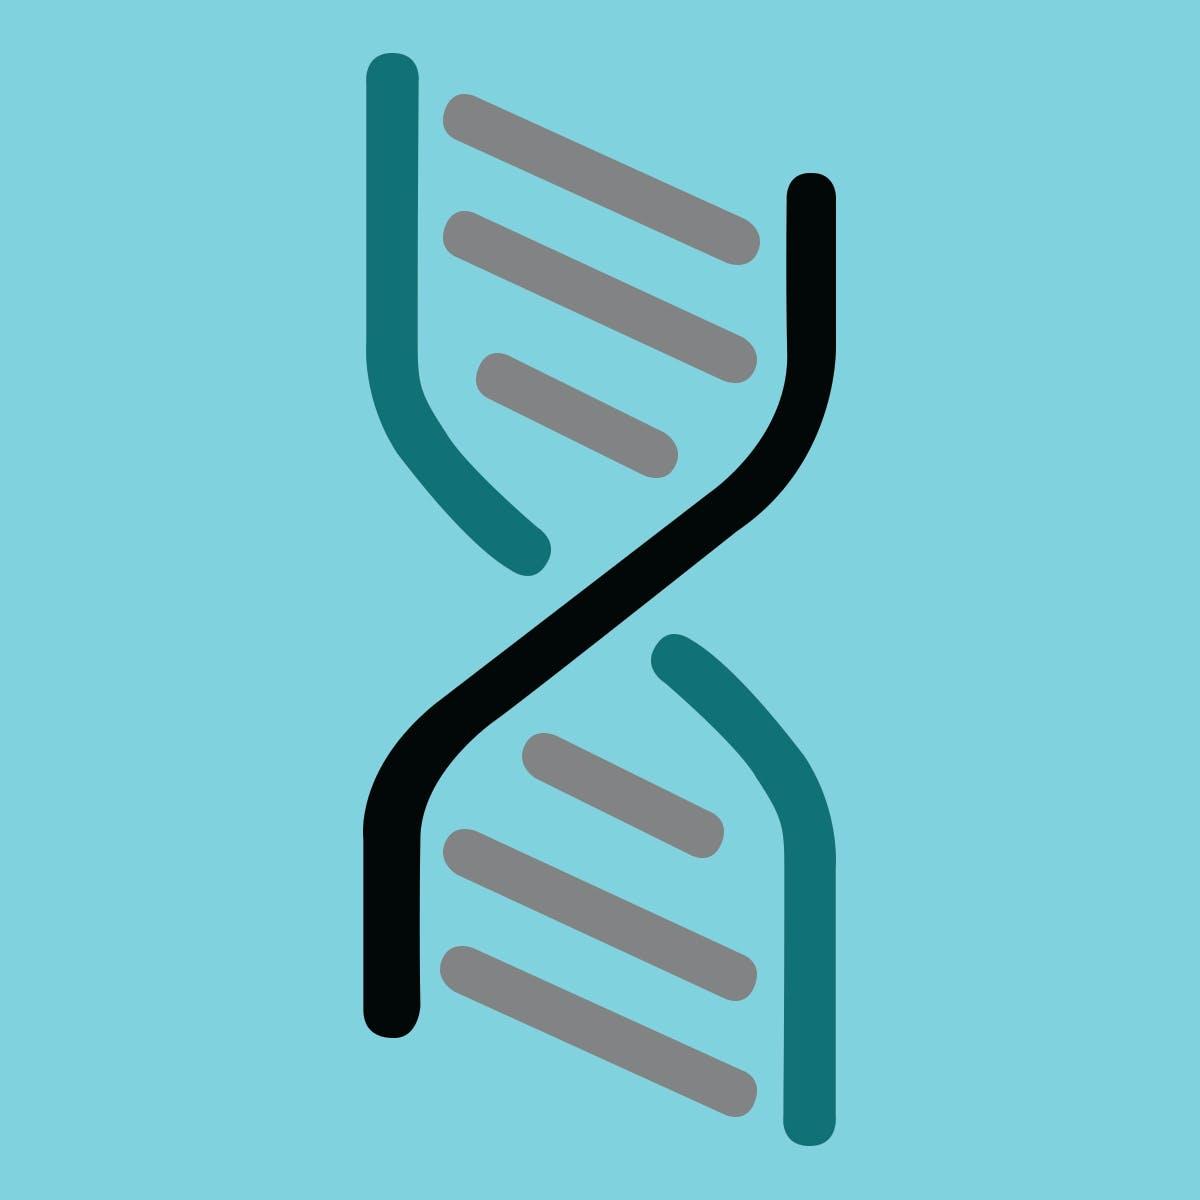 Genomics: Decoding the Universal Language of Life